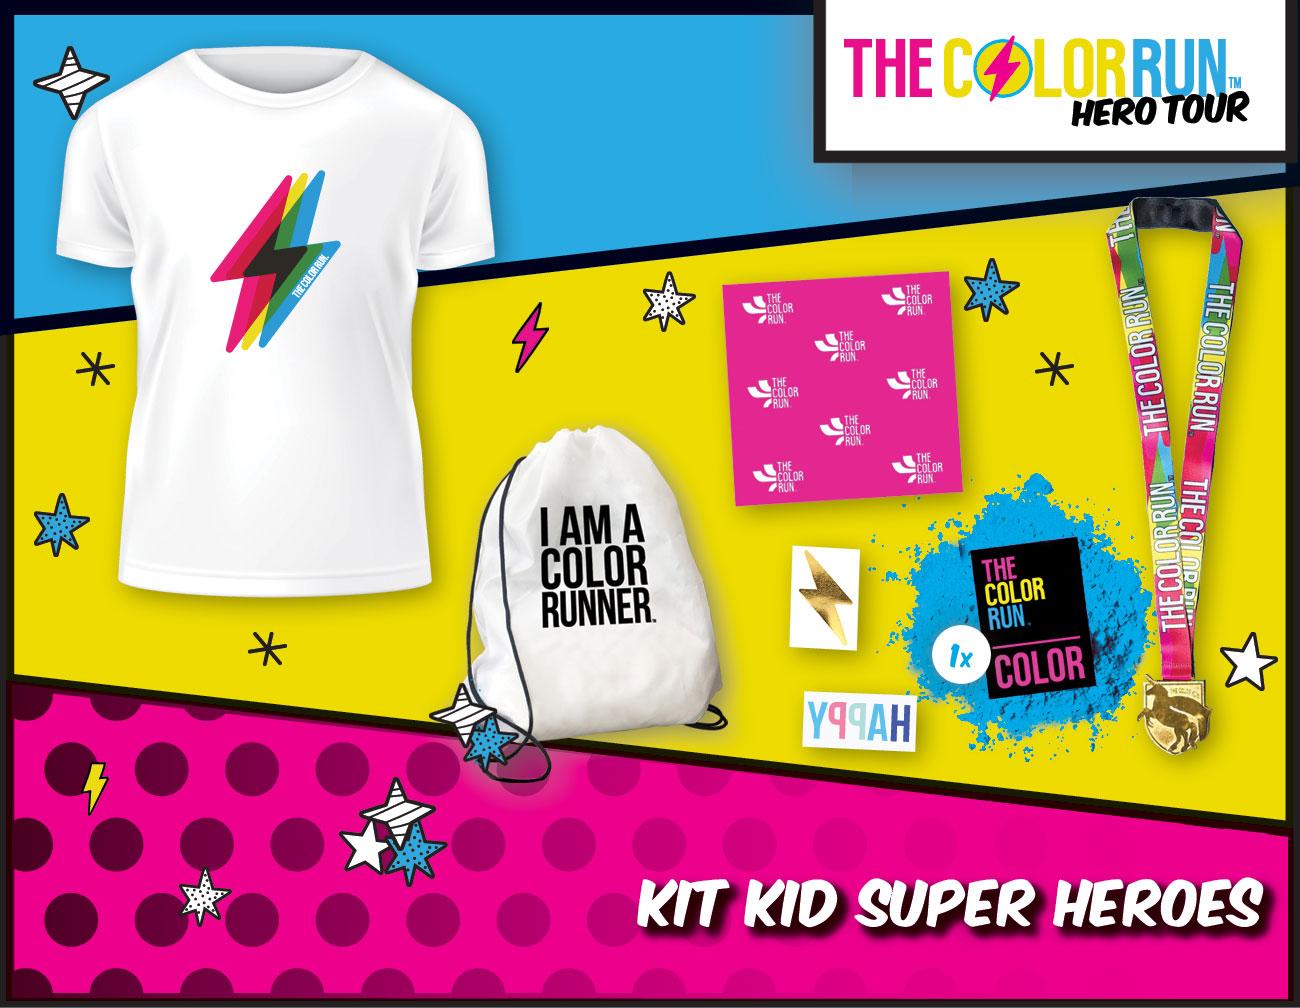 kid Super heroes Participant Kit